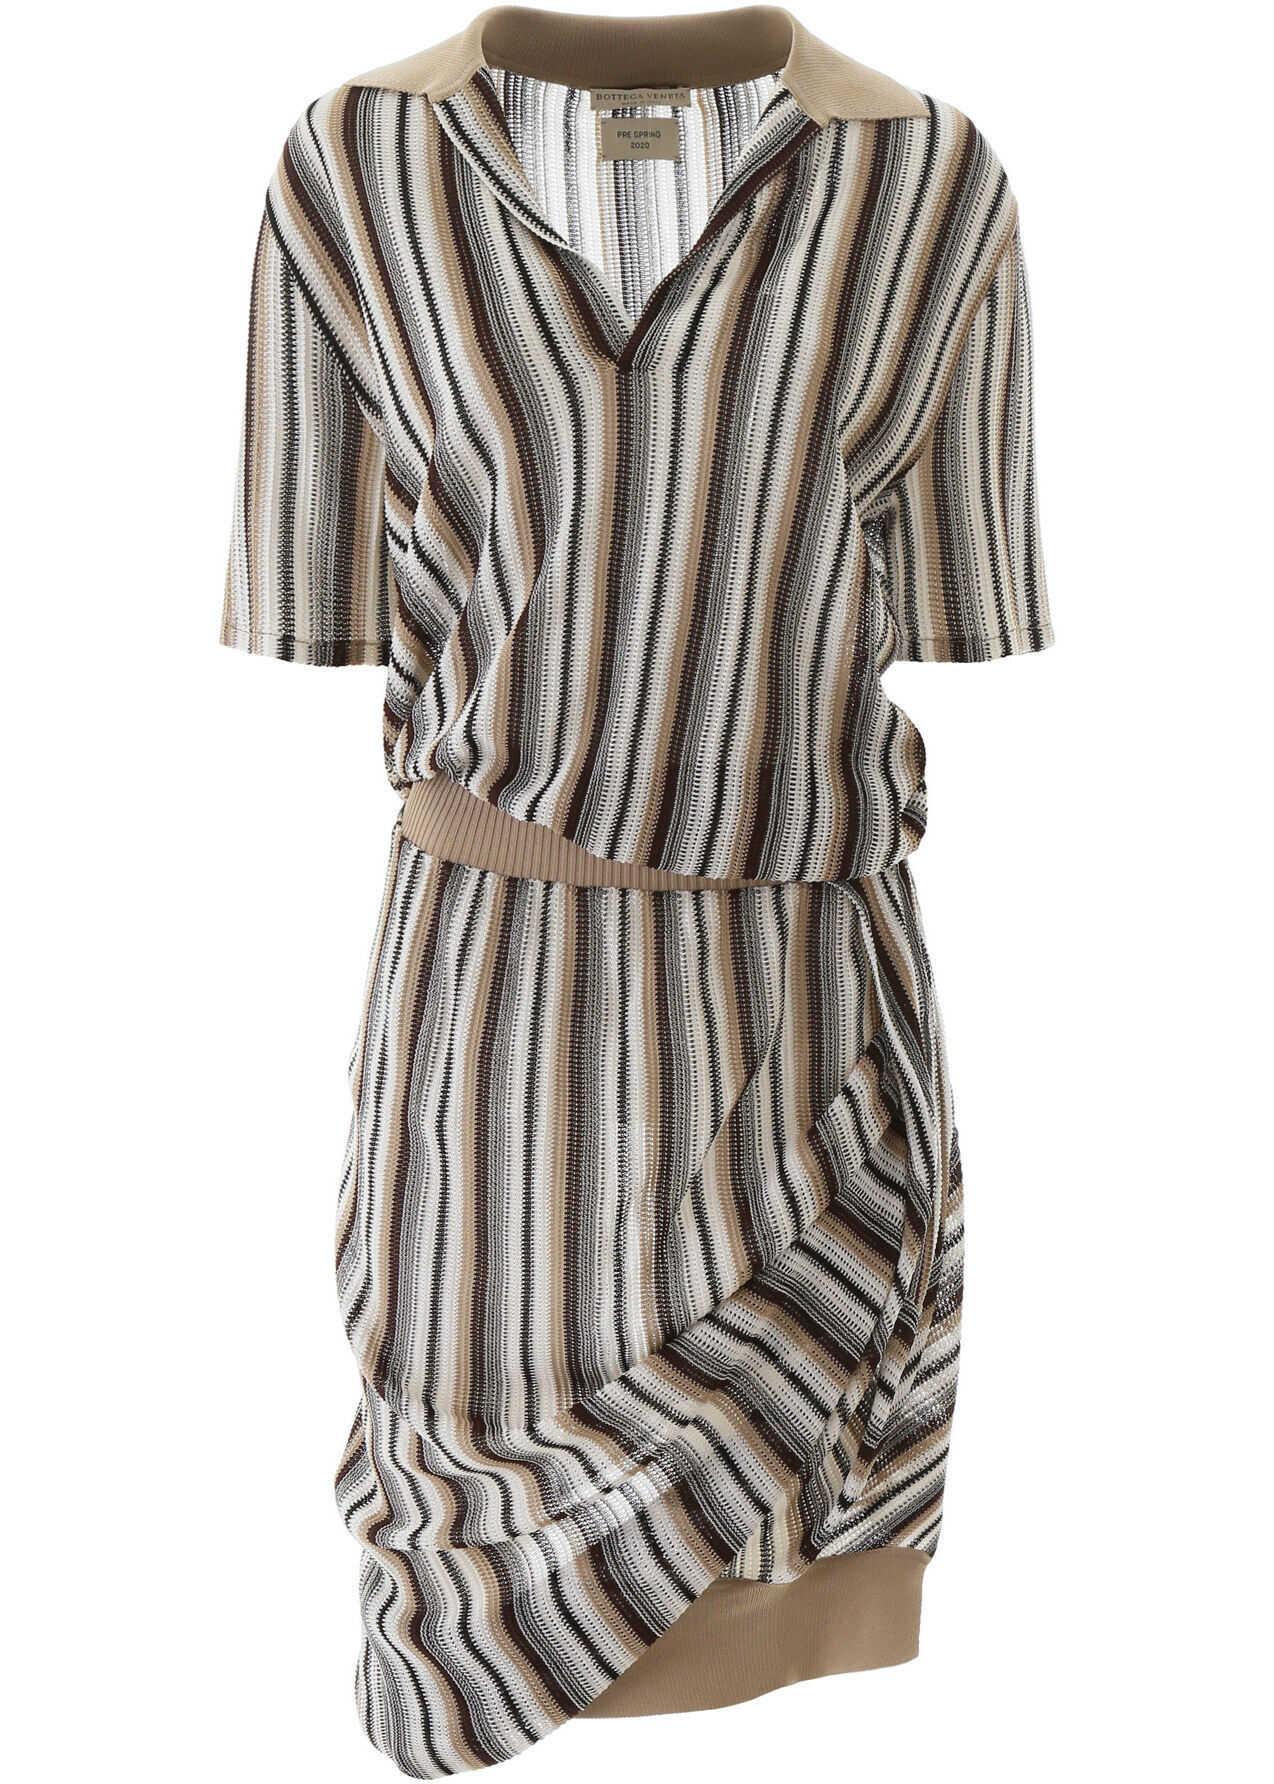 Bottega Veneta Striped Knit Polo Dress MULTICOLOR STRAW